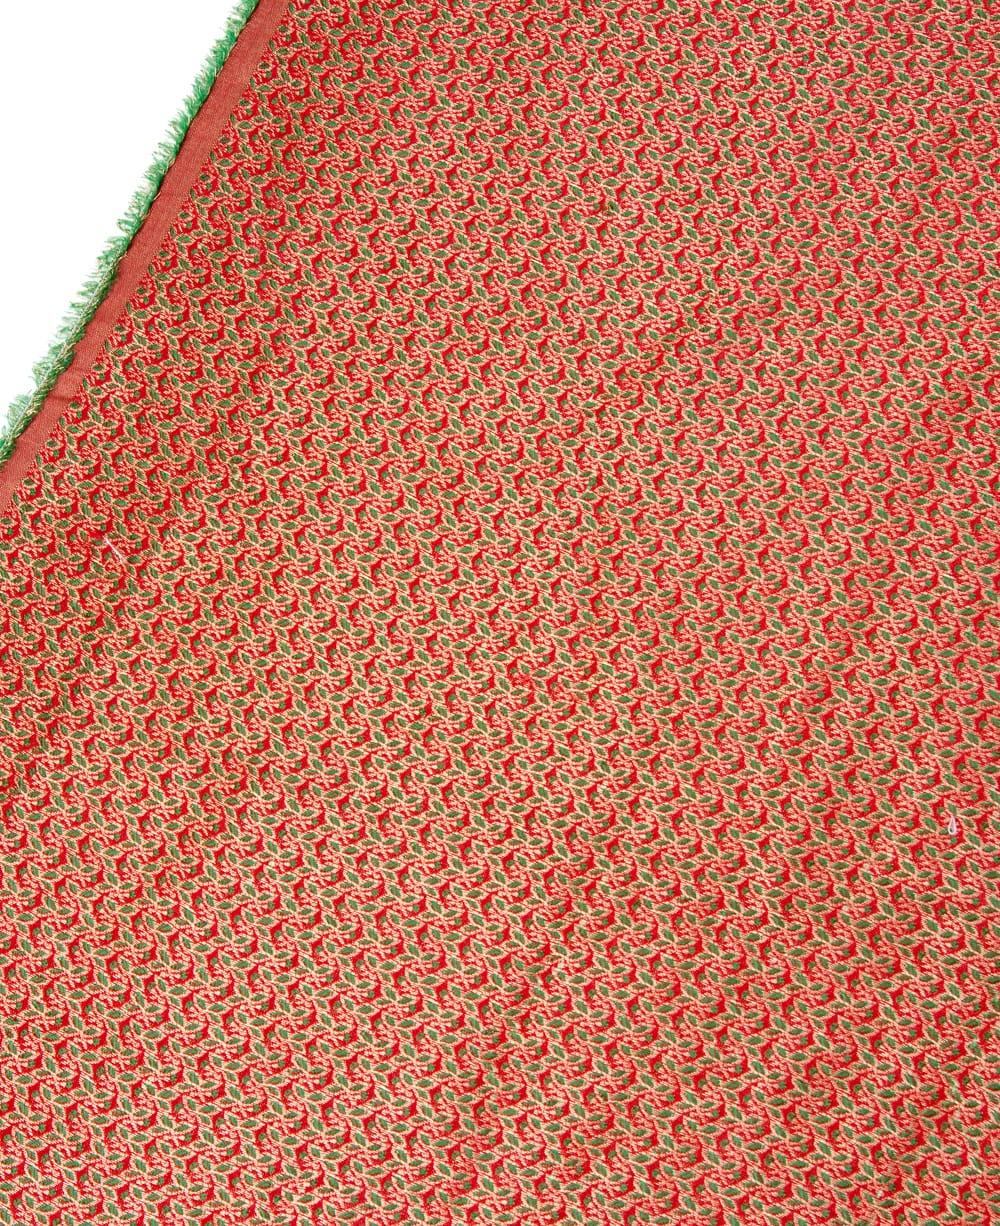 〔1m切り売り〕インドの伝統模様布〔幅約112cm〕 - レッド×グリーン 3 - 拡大写真です。独特な雰囲気があります。